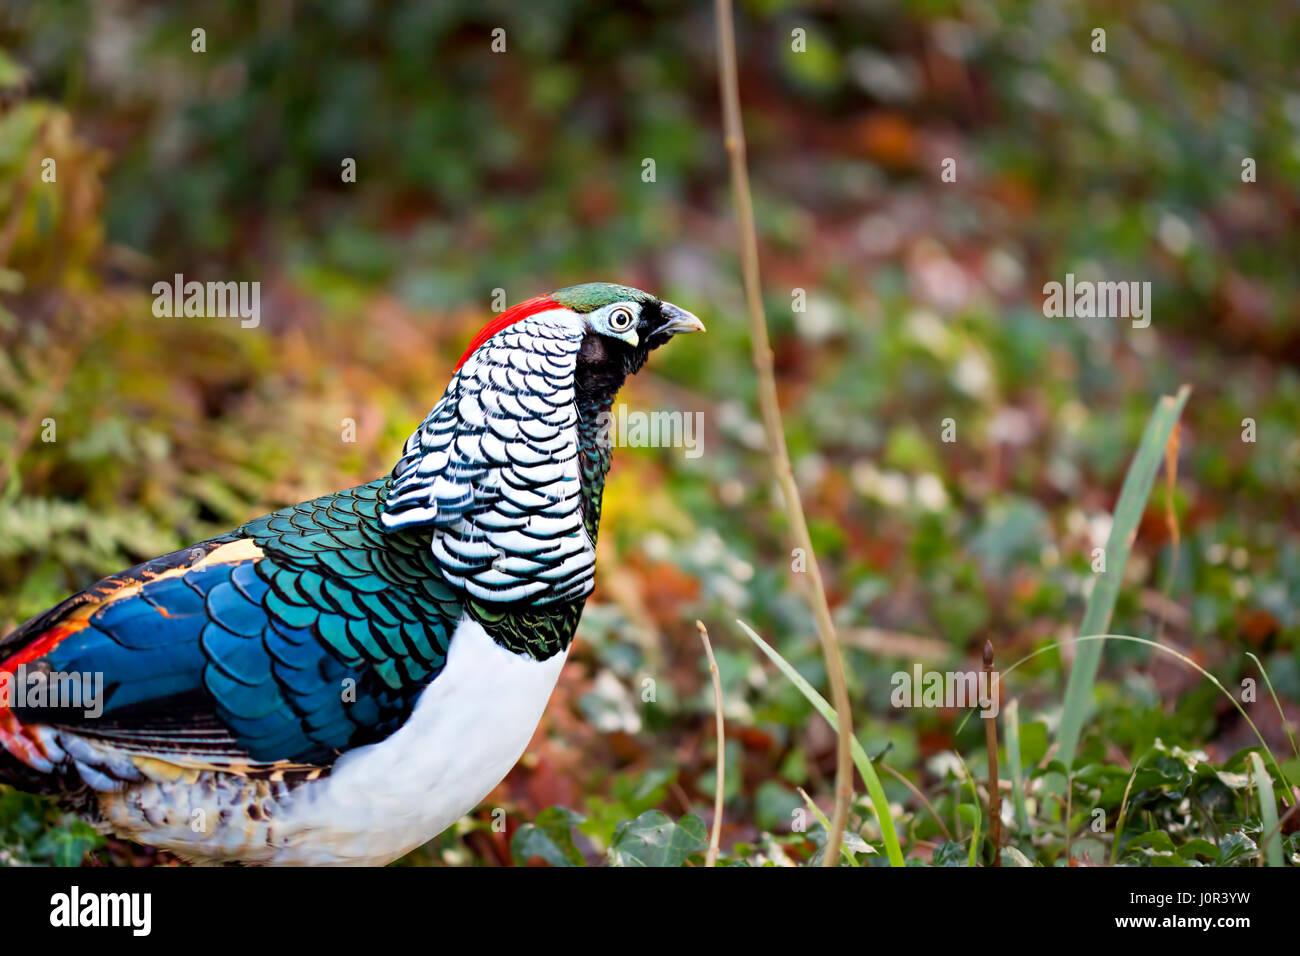 Lady Amherst's pheasant - Stock Image